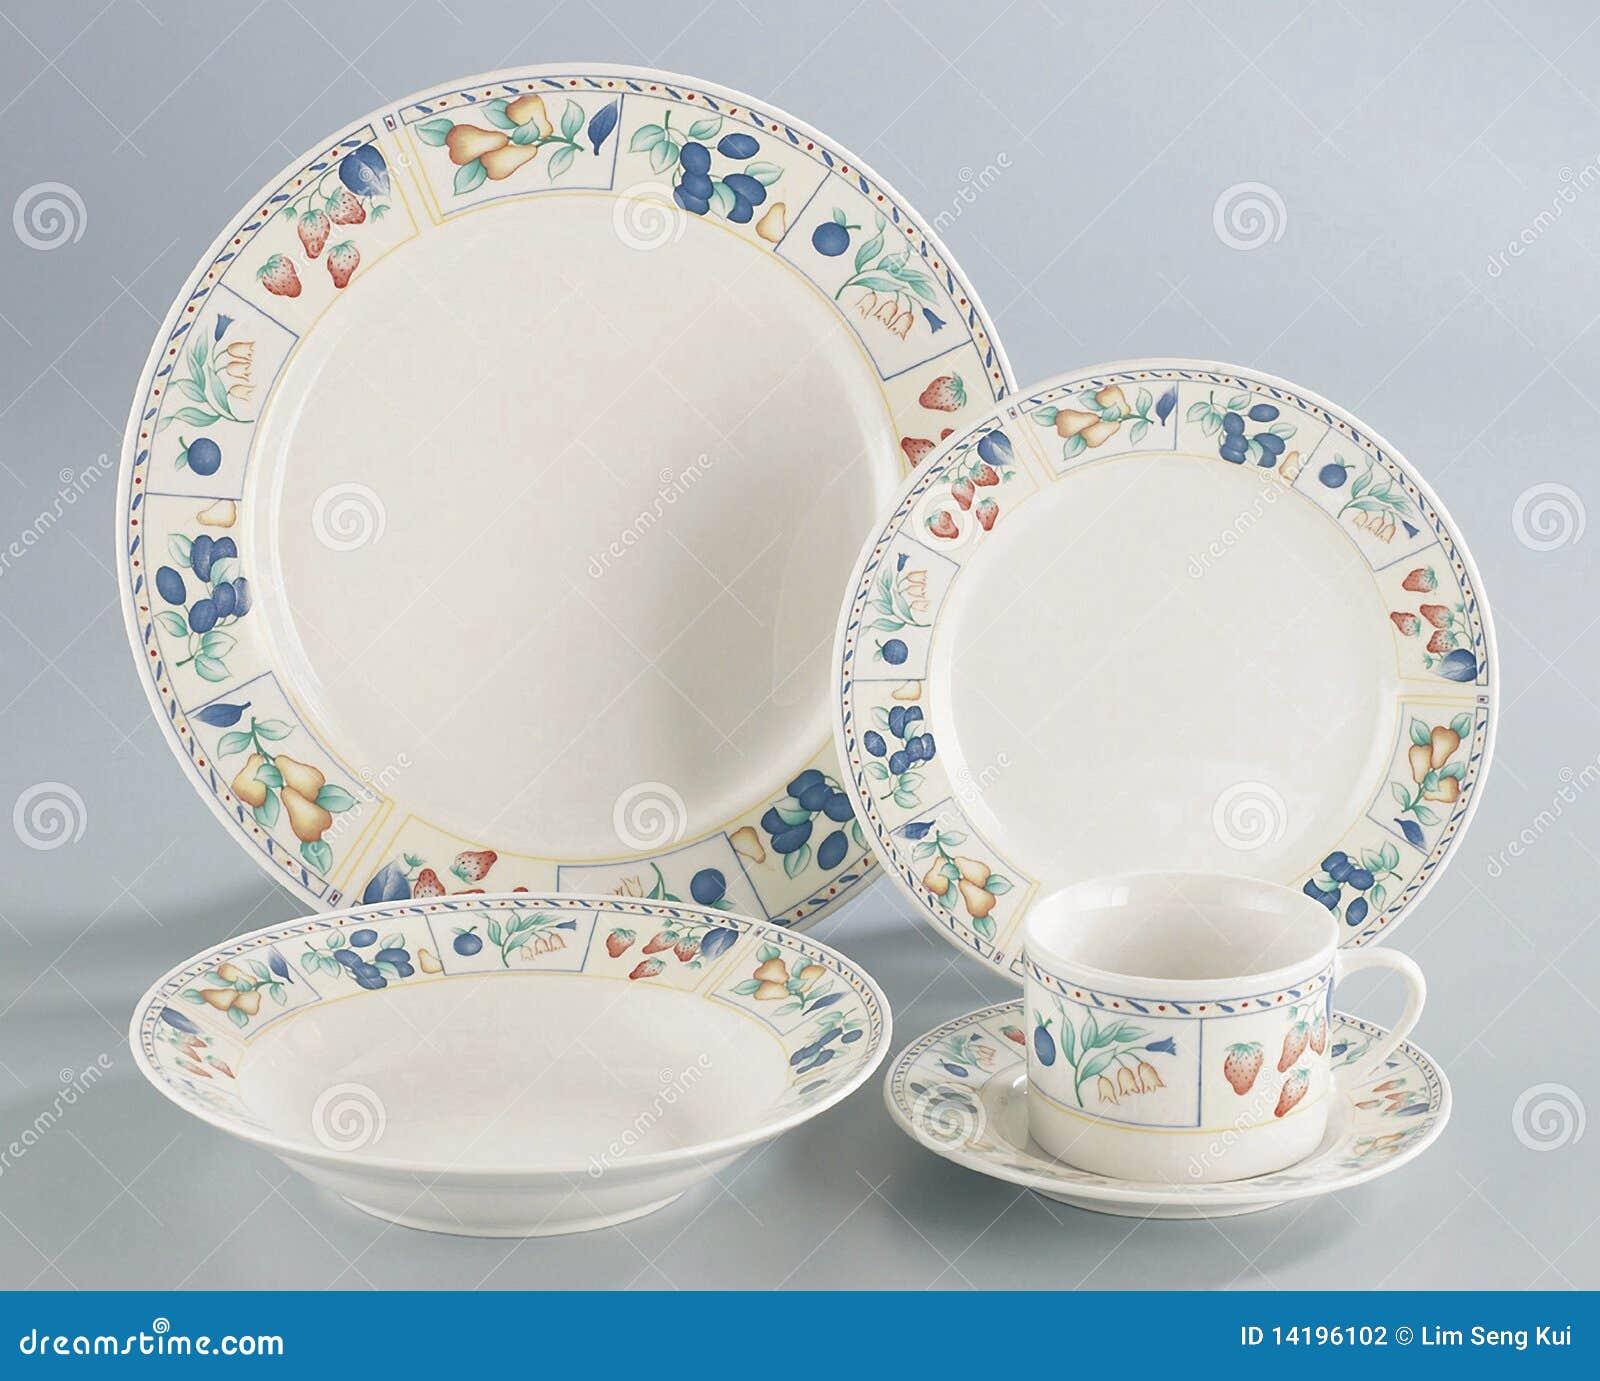 set of plates stock photography image 14196102